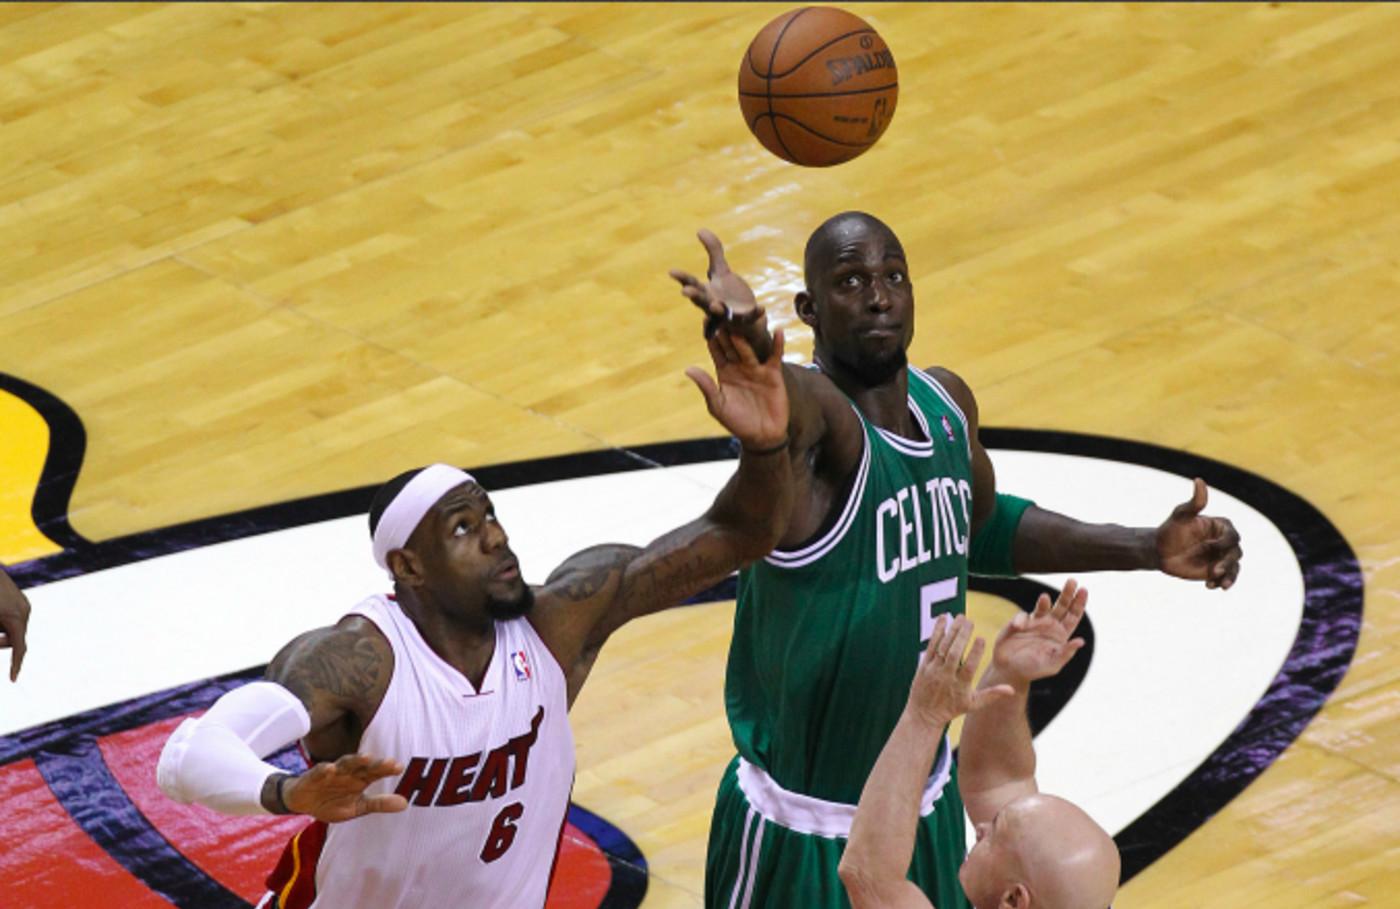 Boston Celtics power forward Kevin Garnett (#5) wins the opening tipoff